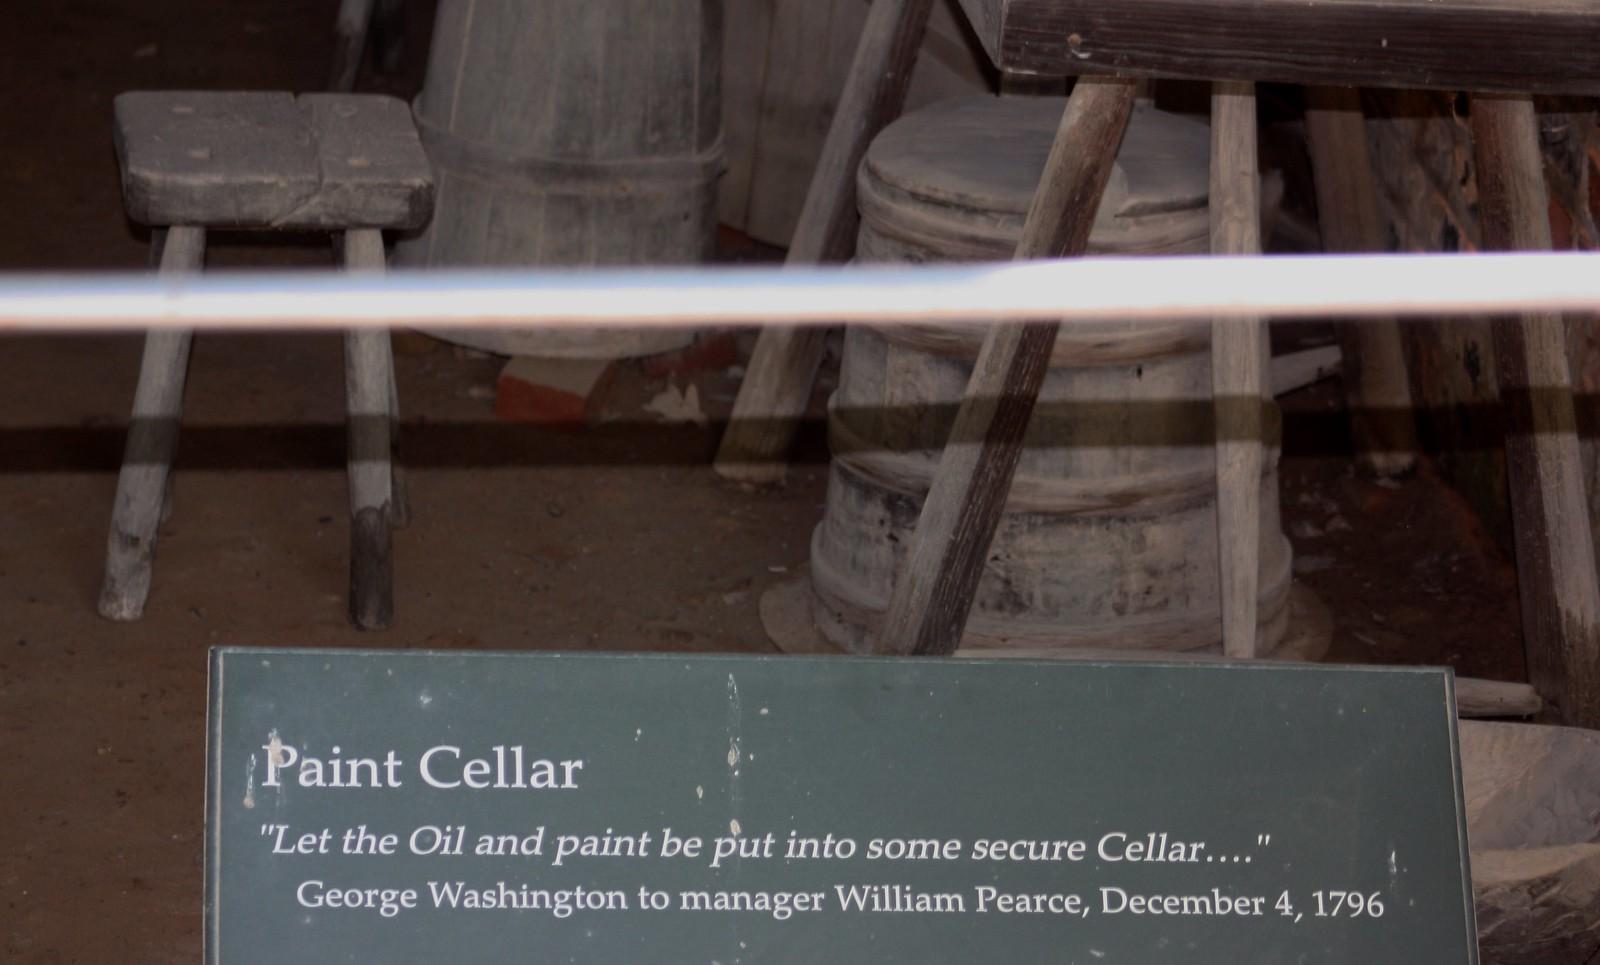 Mount Vernon Paint Cellar